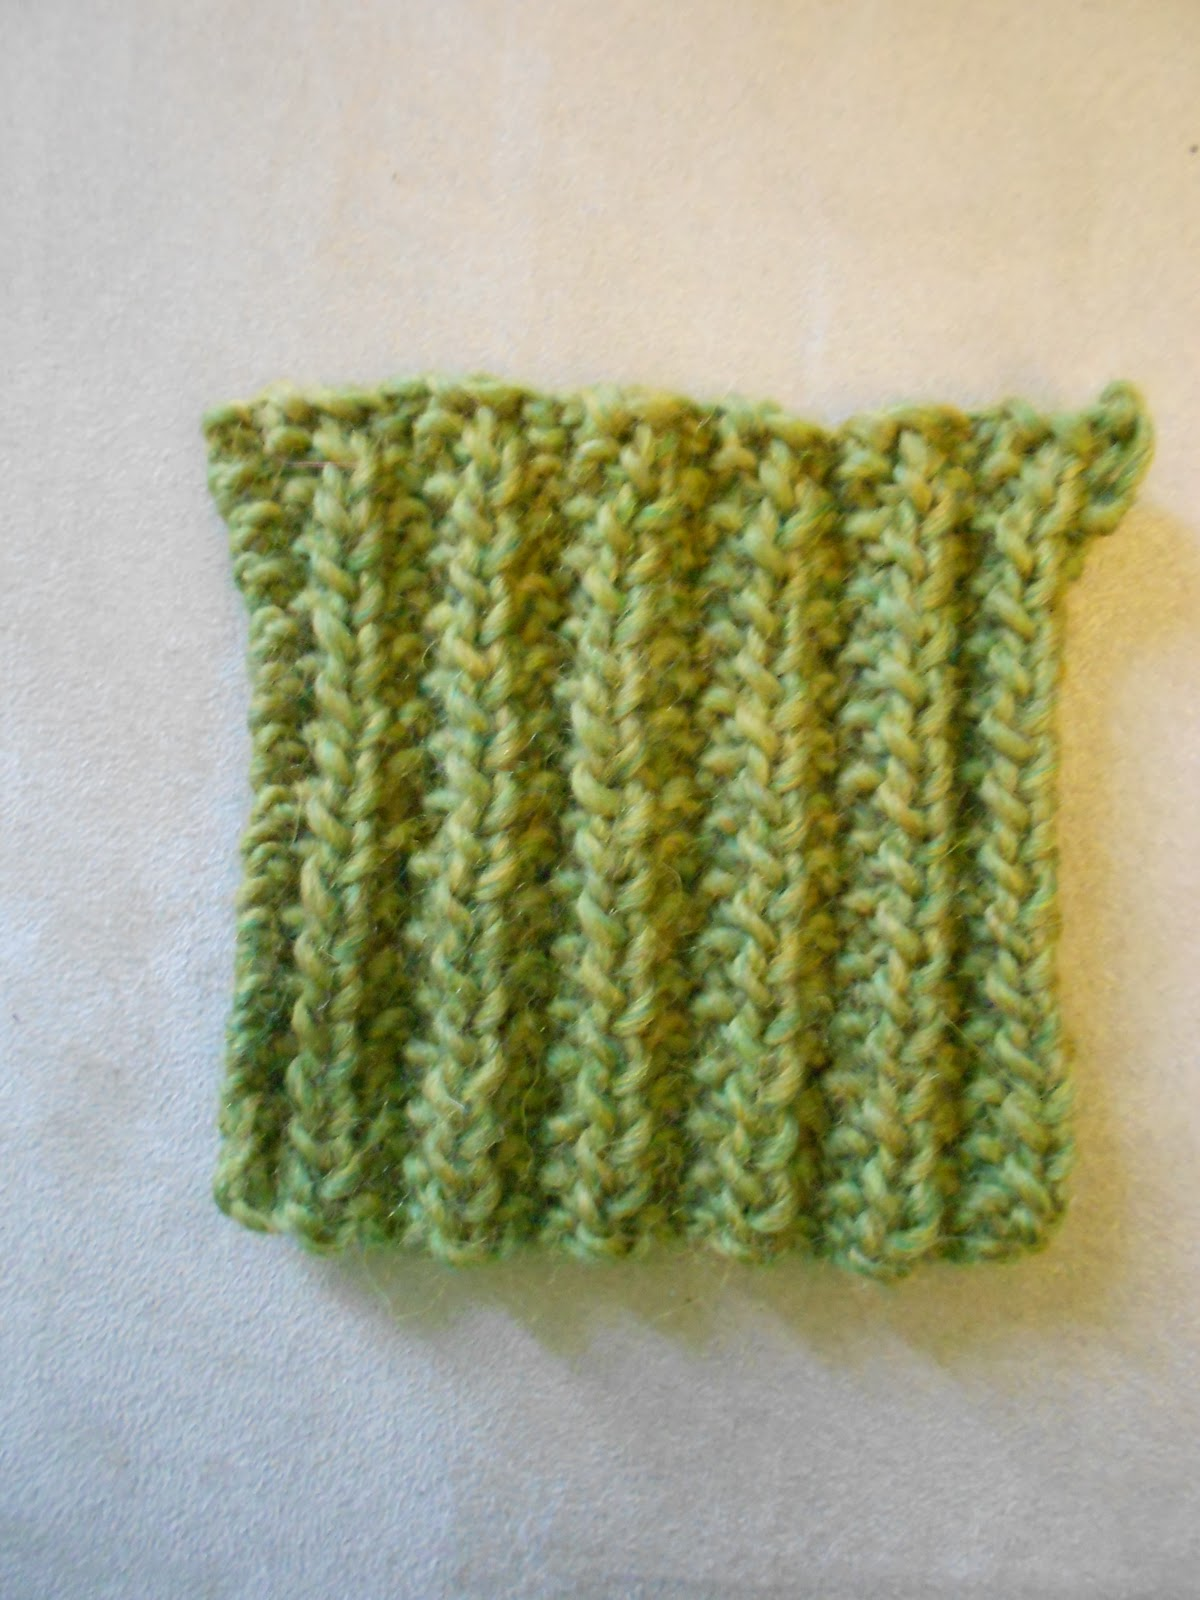 Knitting Stitch Mistake Rib : Blue Betty: Stitch Guide: Mistake Rib